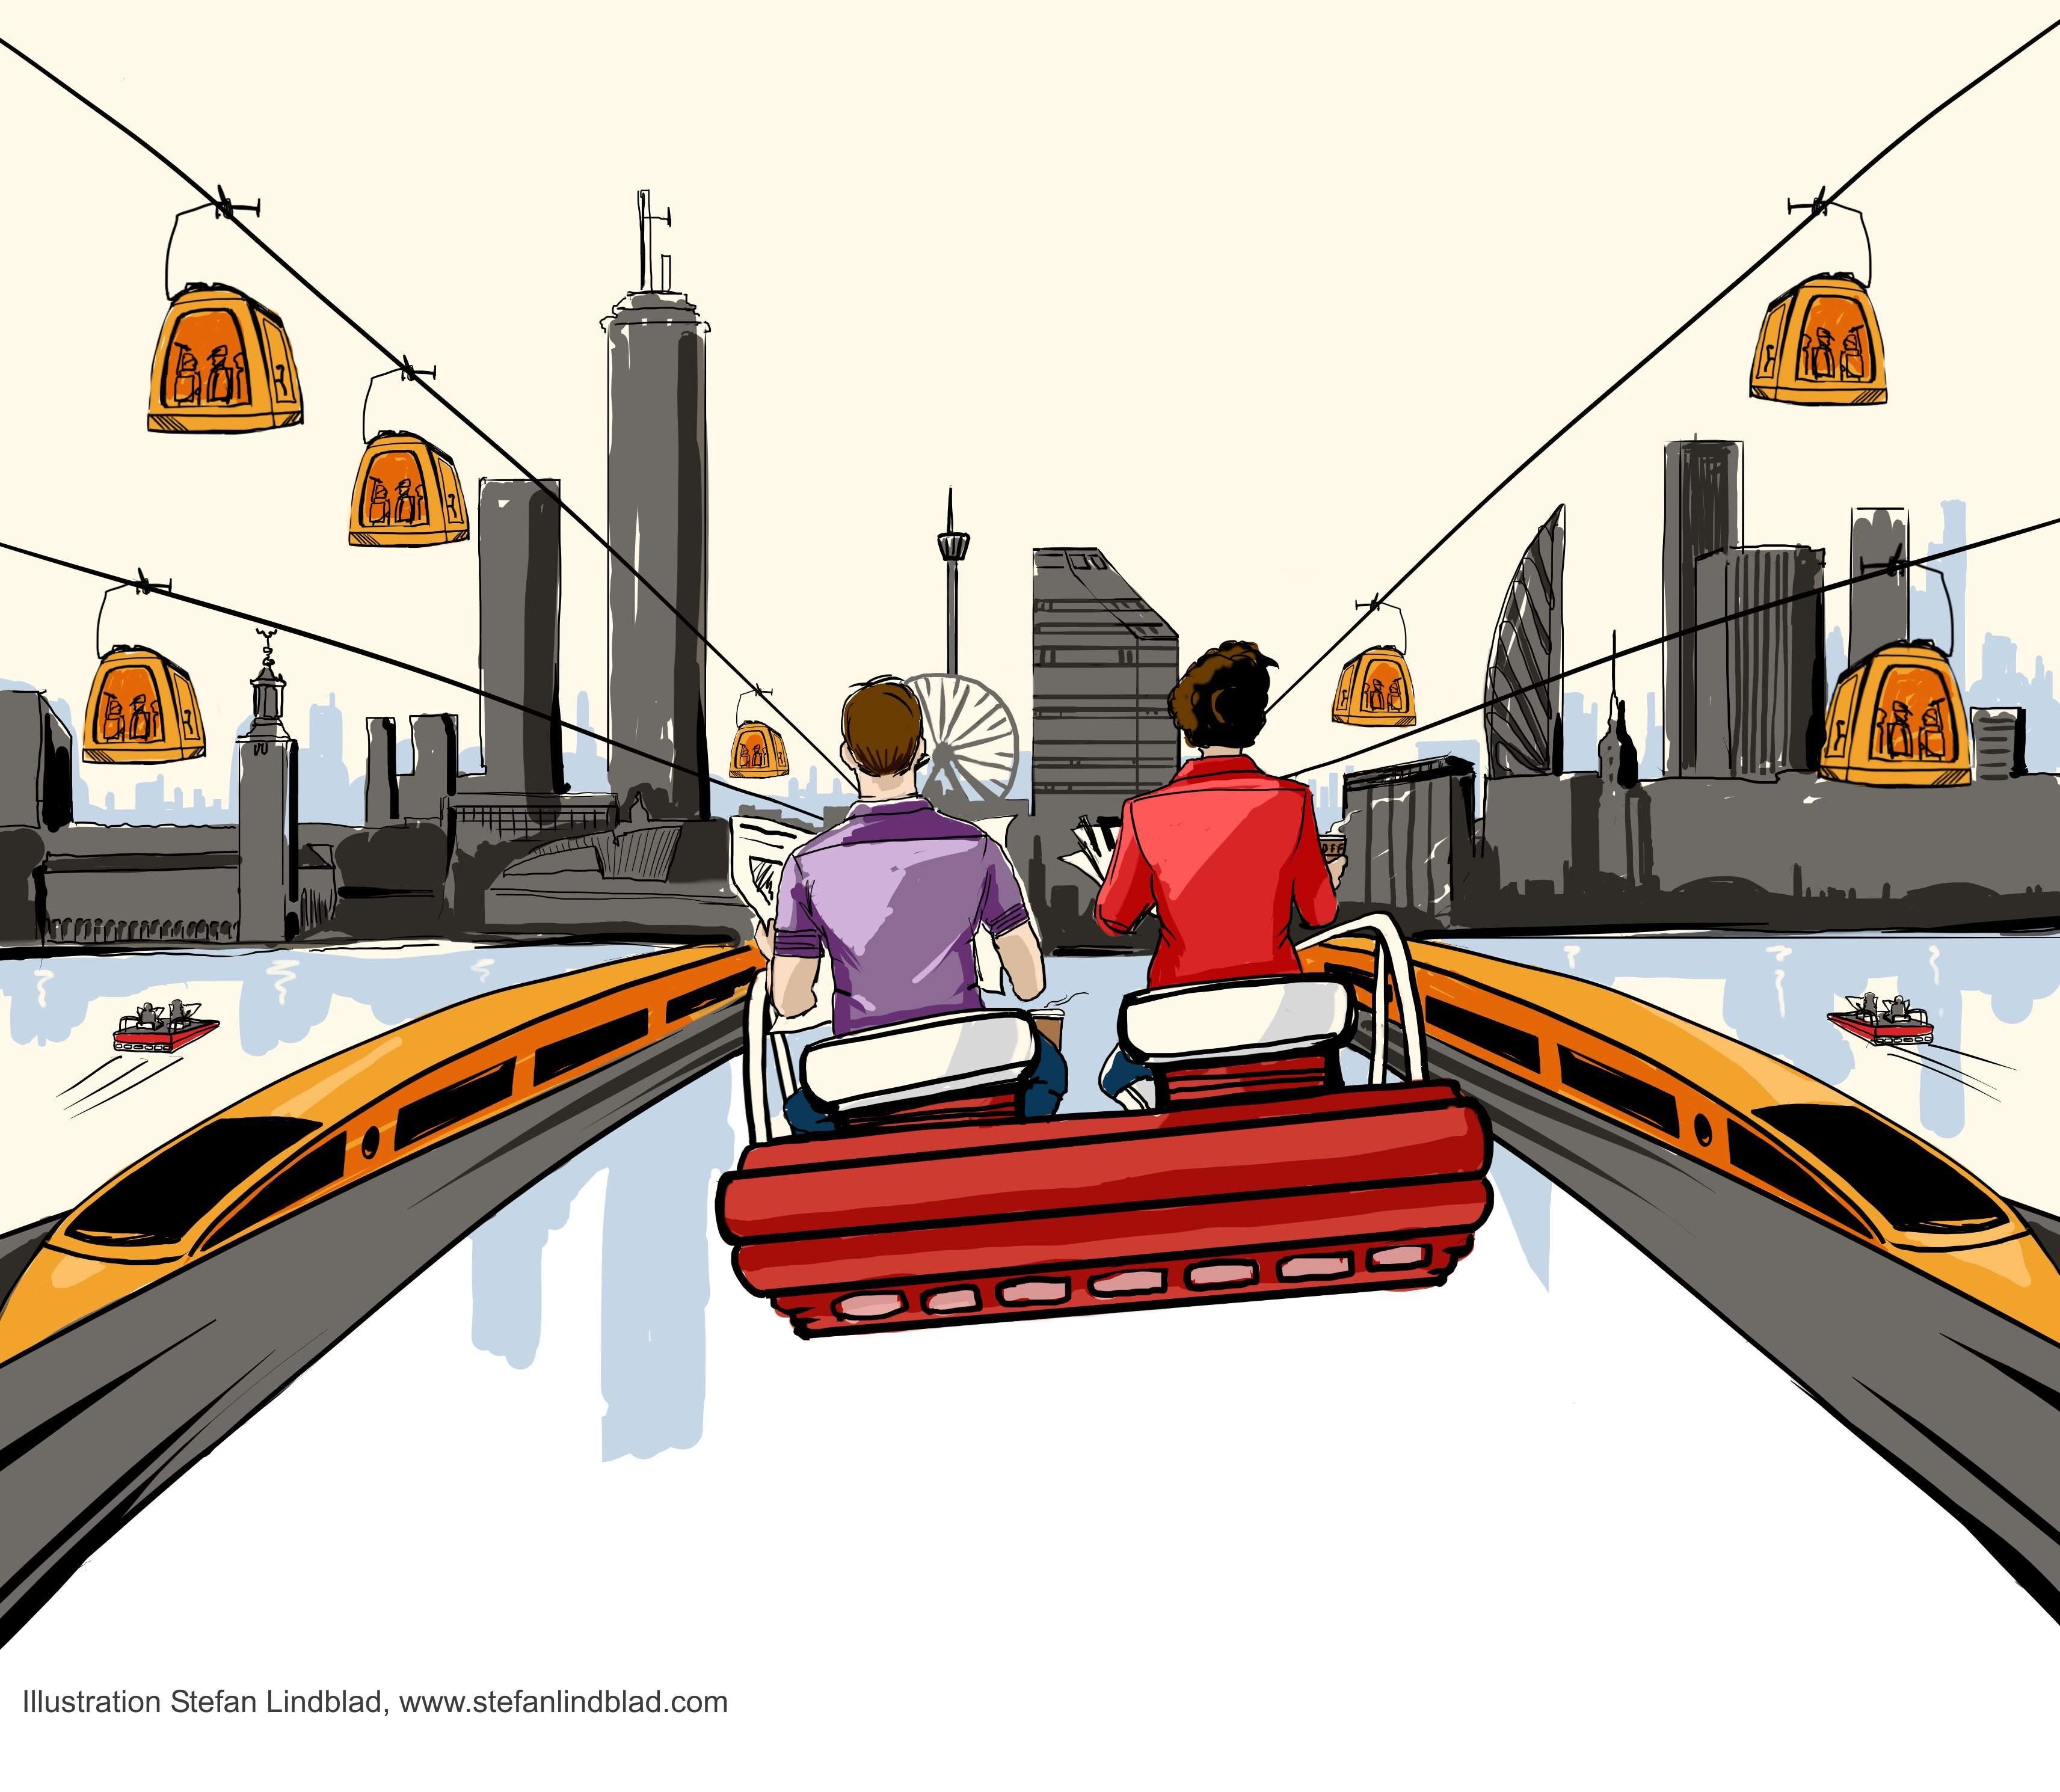 Stefan-Lindblad_IllustrationTransDevInbjudan_2016